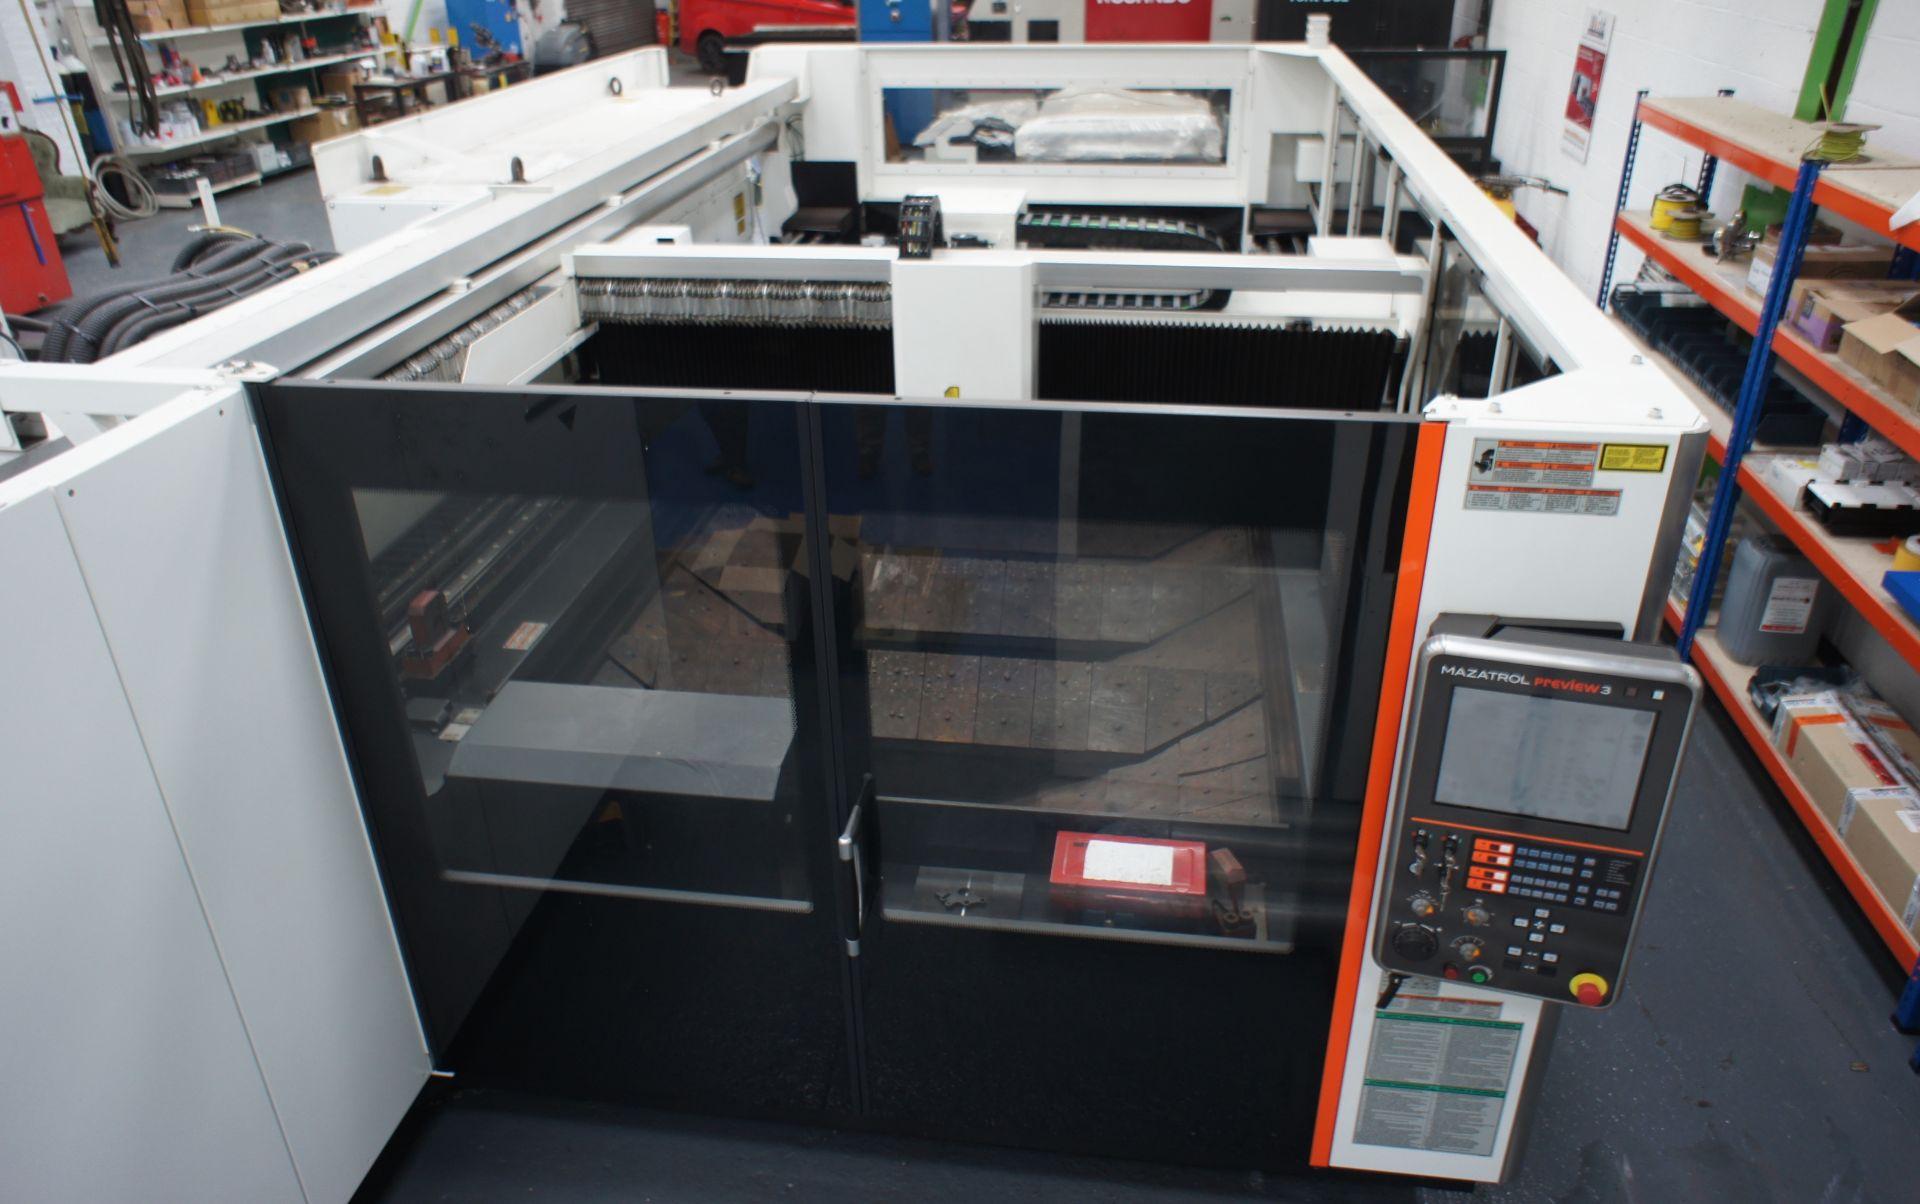 2015 - Mazak OptiPlex 4020 II Laser Cutting Machin - Image 3 of 15